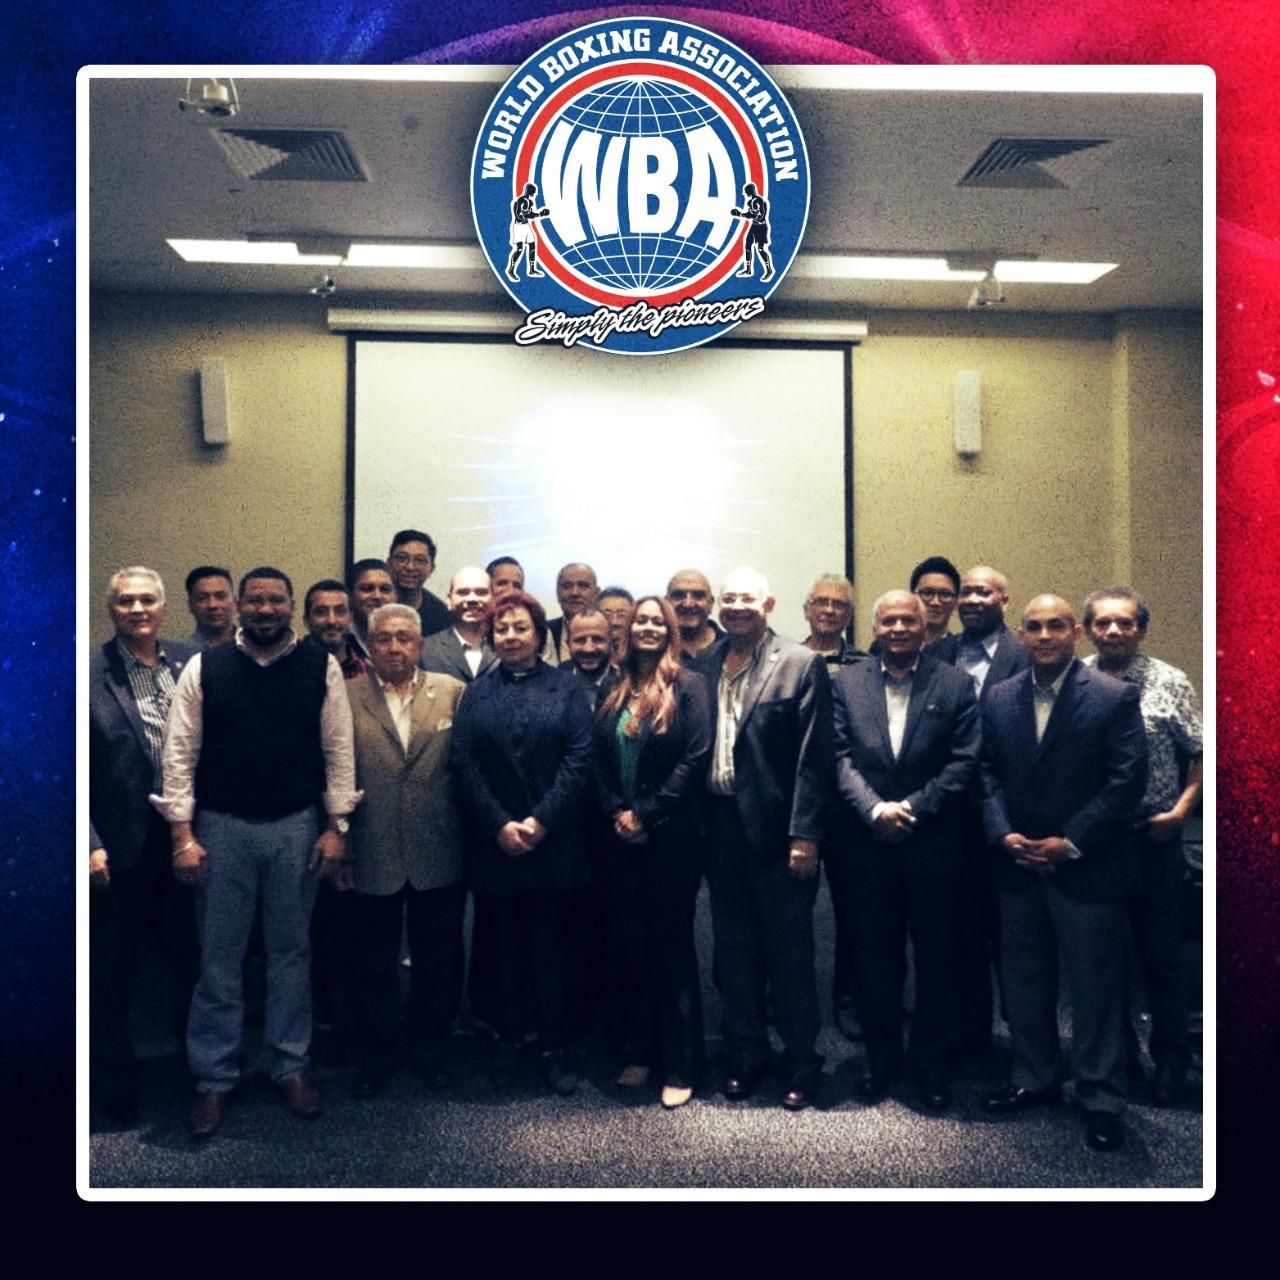 AMB Board Meeting was a success